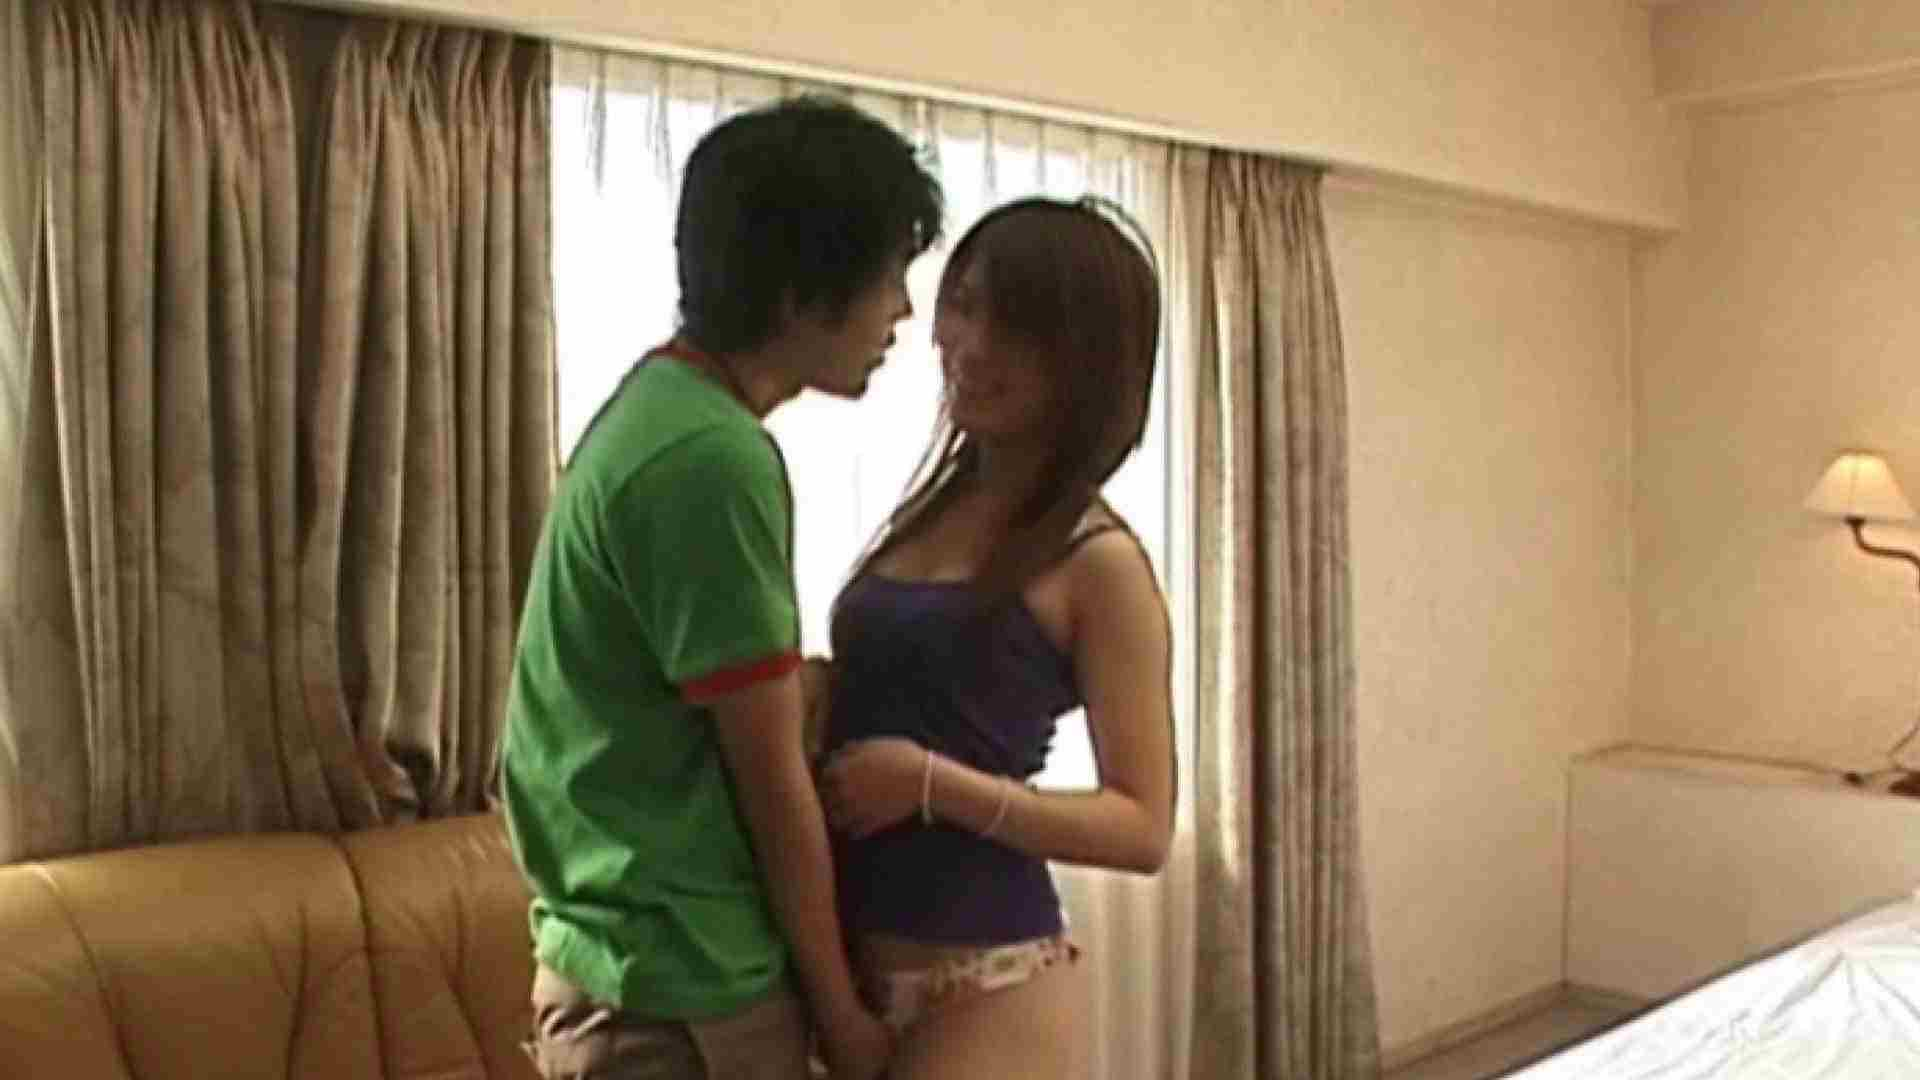 S級厳選美女ビッチガールVol.53 美女丸裸 | モデル  100pic 46